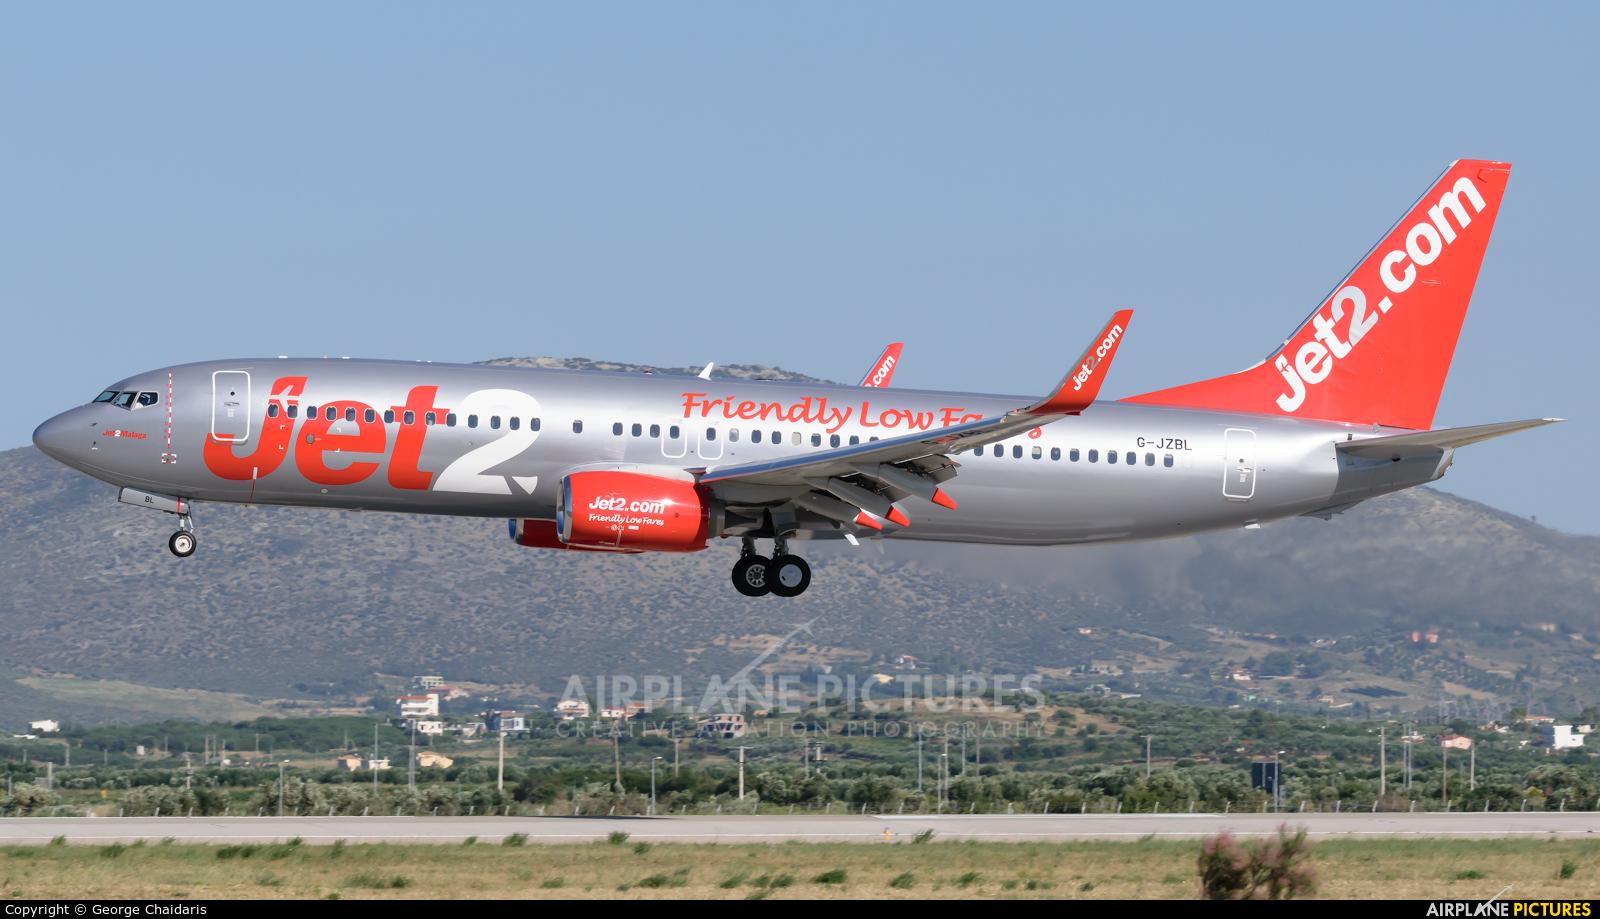 Jet2 G-JZBL aircraft at Athens - Eleftherios Venizelos